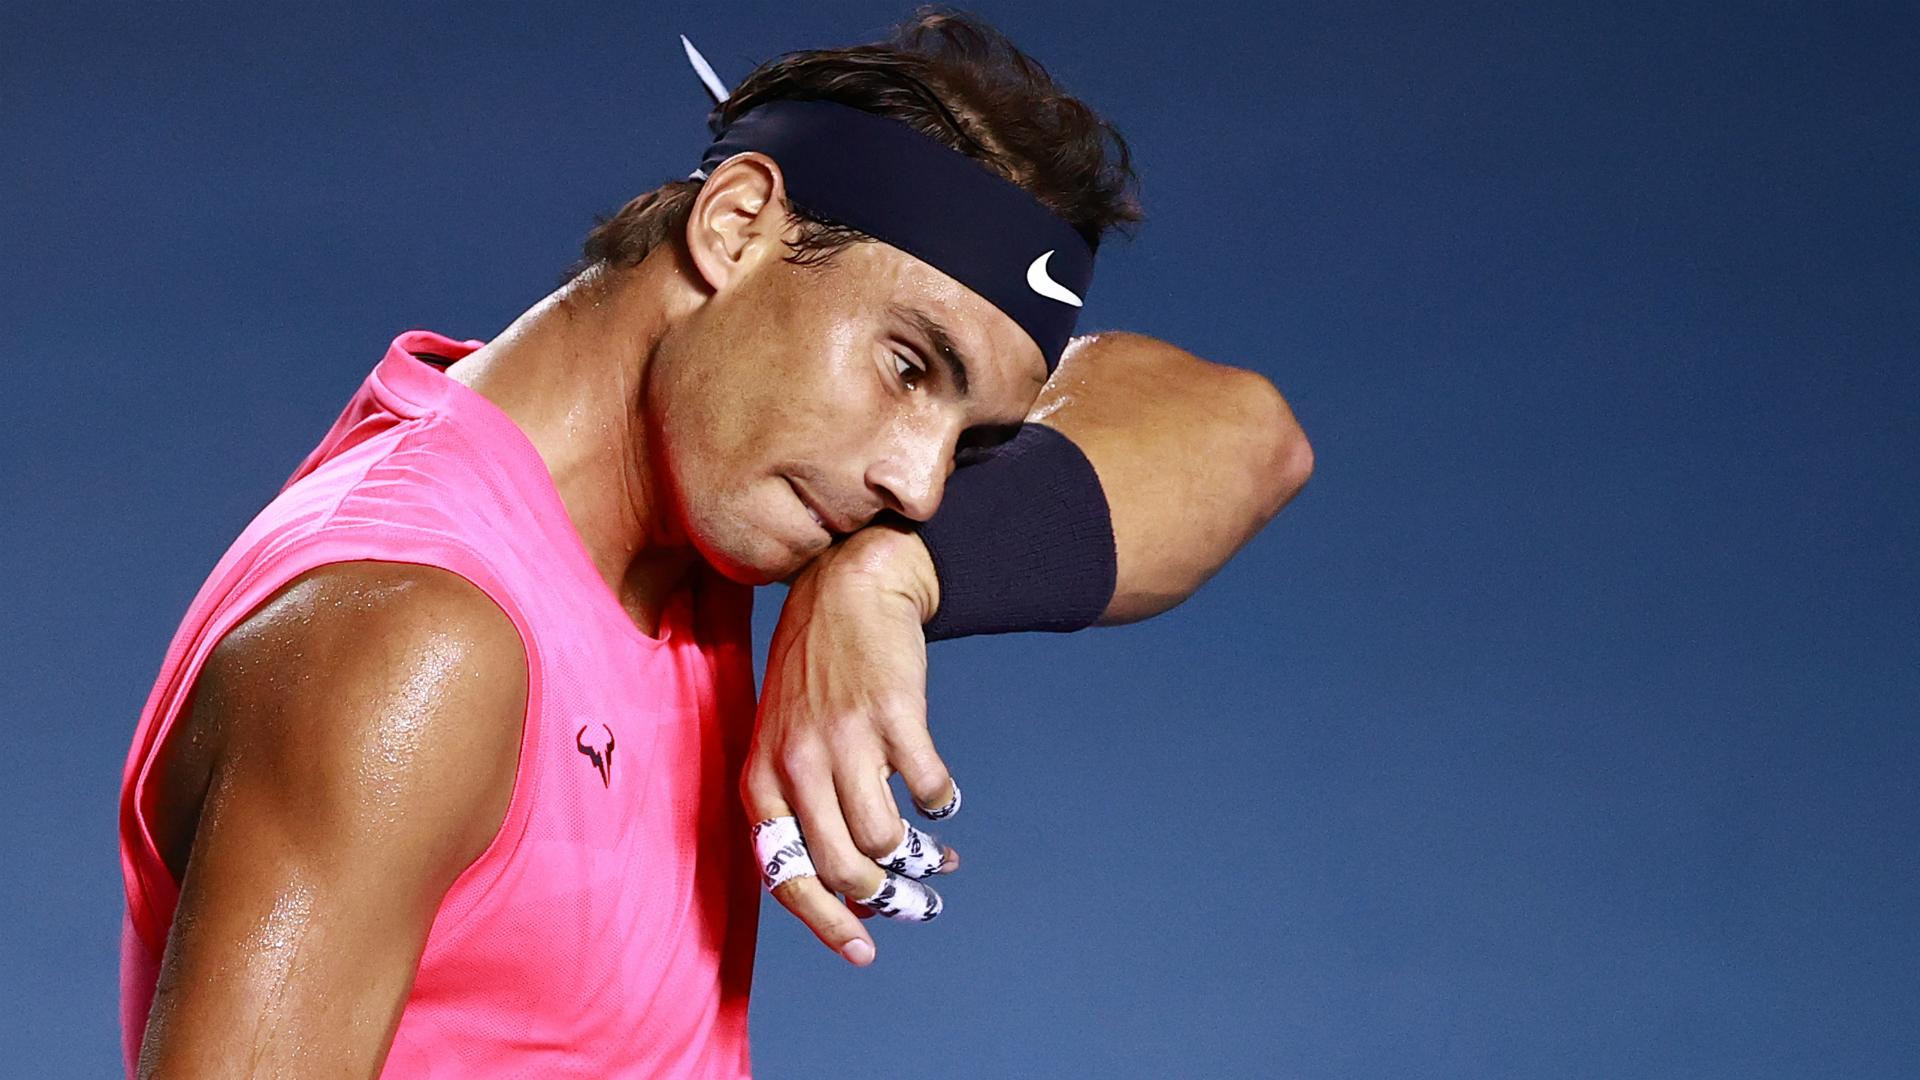 Coronavirus: Nadal worried about his tennis future amid hiatus